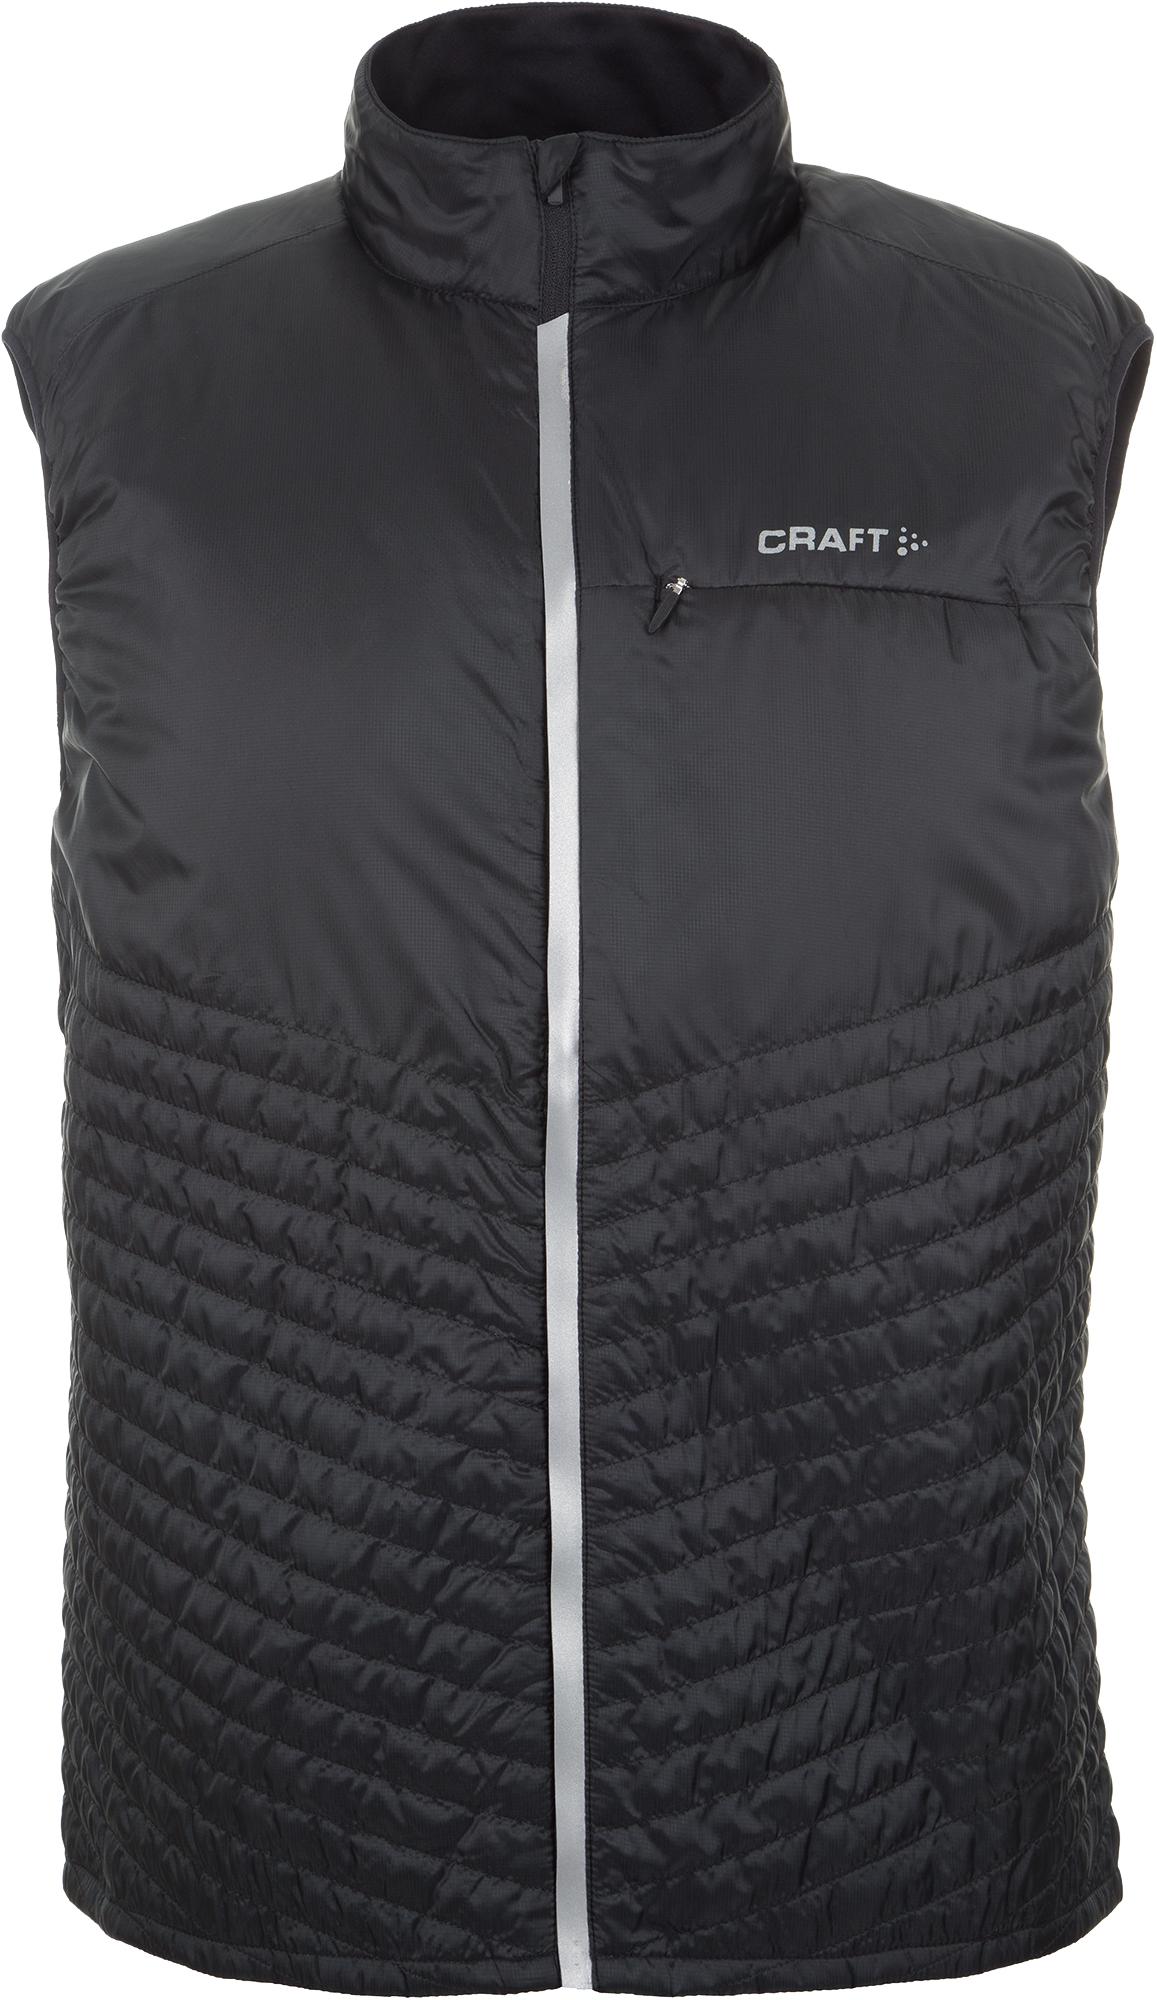 Craft Жилет утепленный мужской Craft Urban Run Body Warmer, размер 52-54 цена